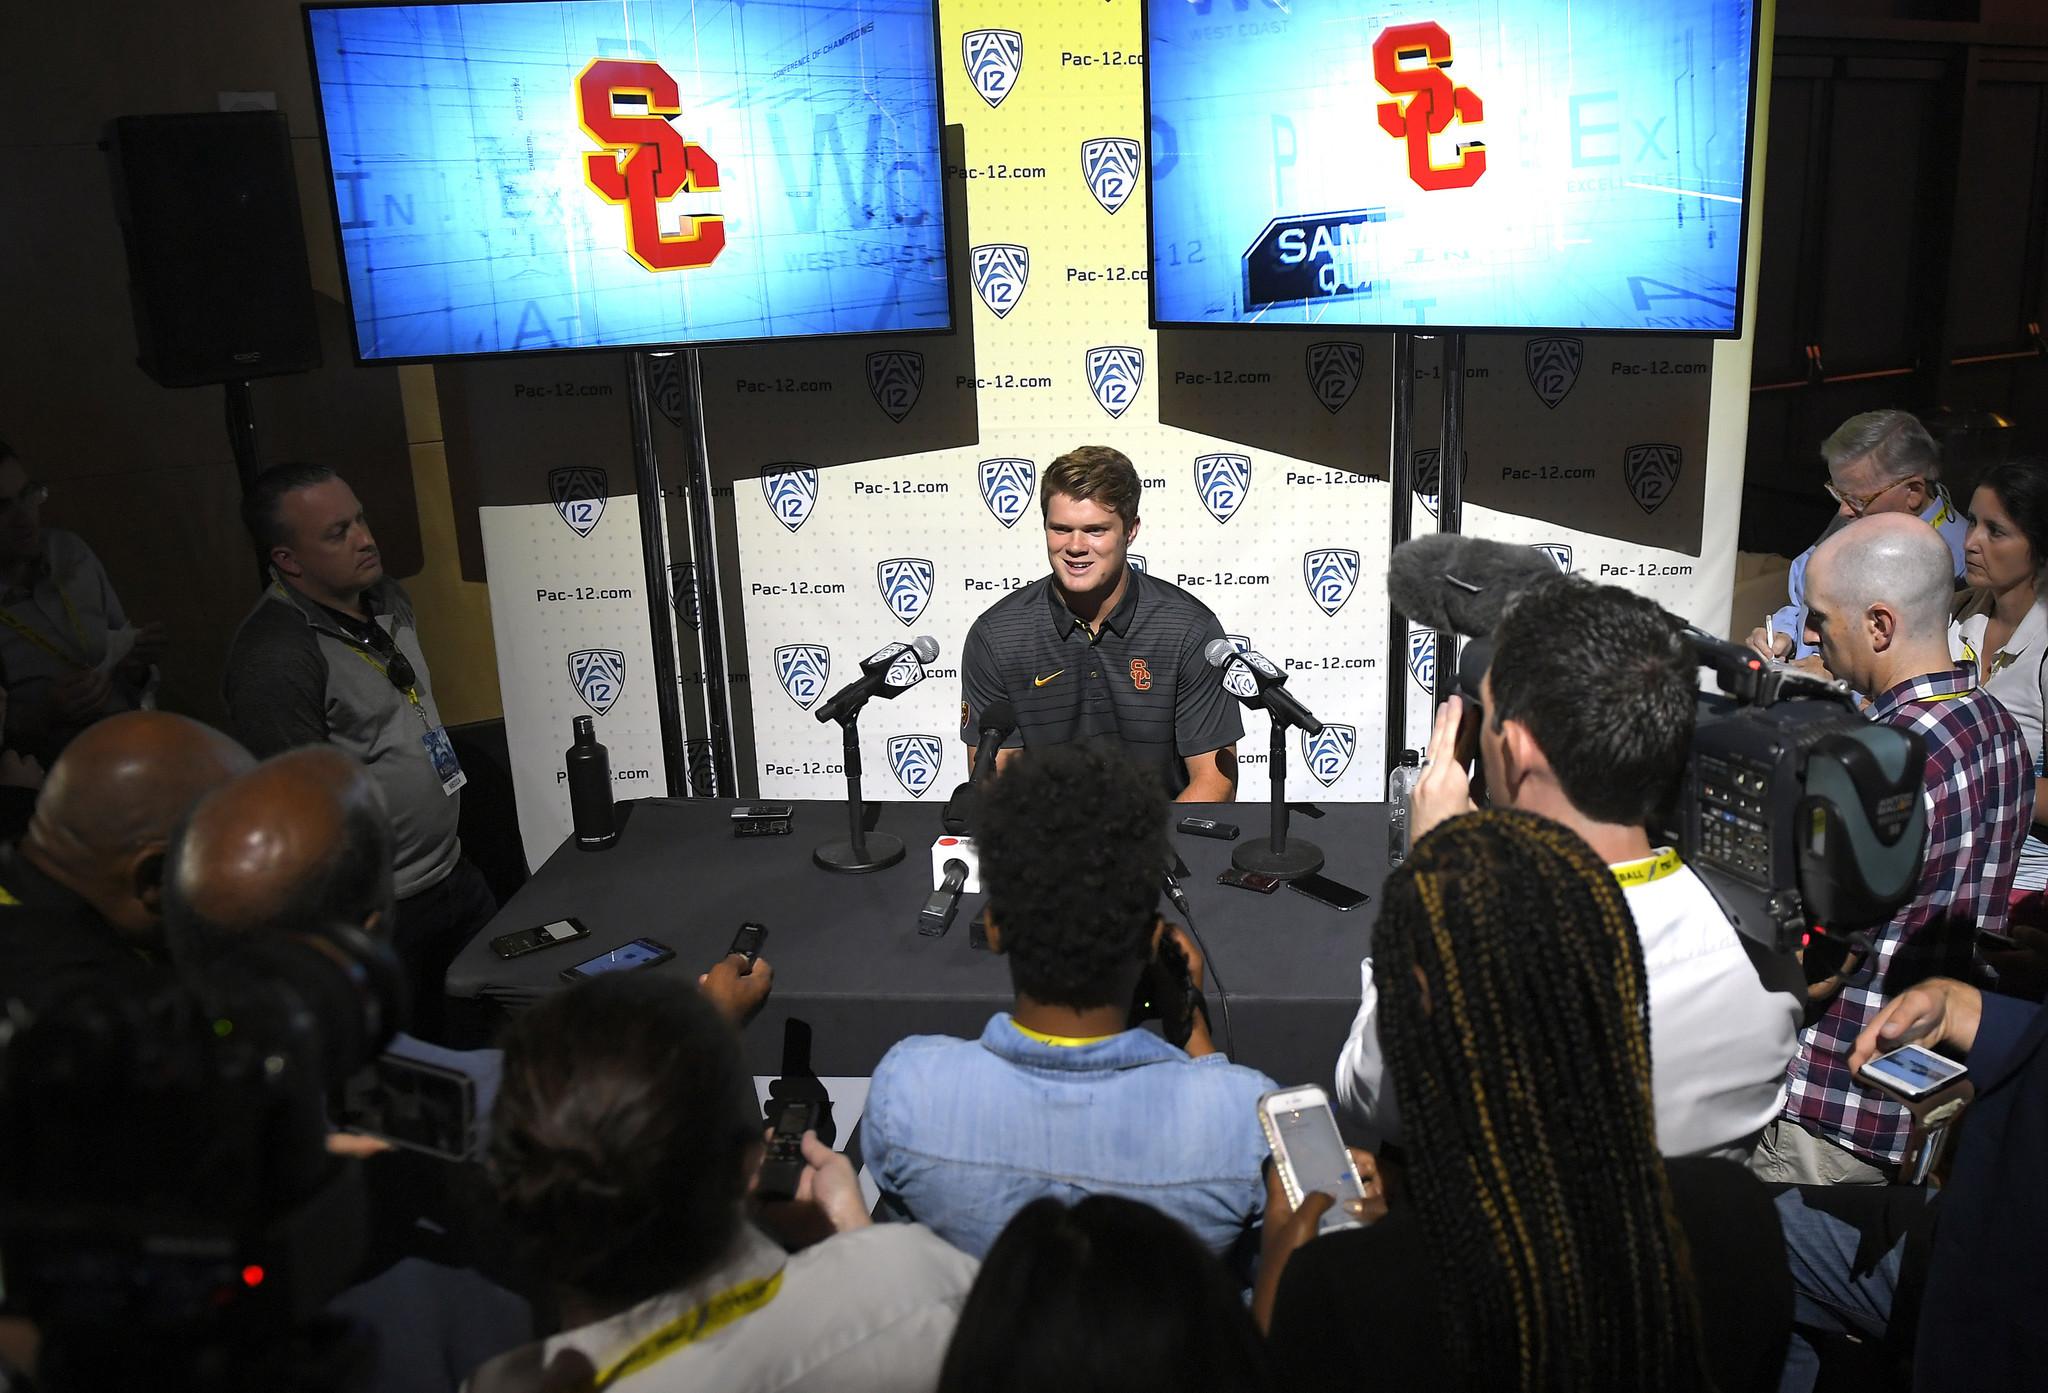 USC quarterback Sam Darnold speaks at Pac-12 media days in Hollywood.